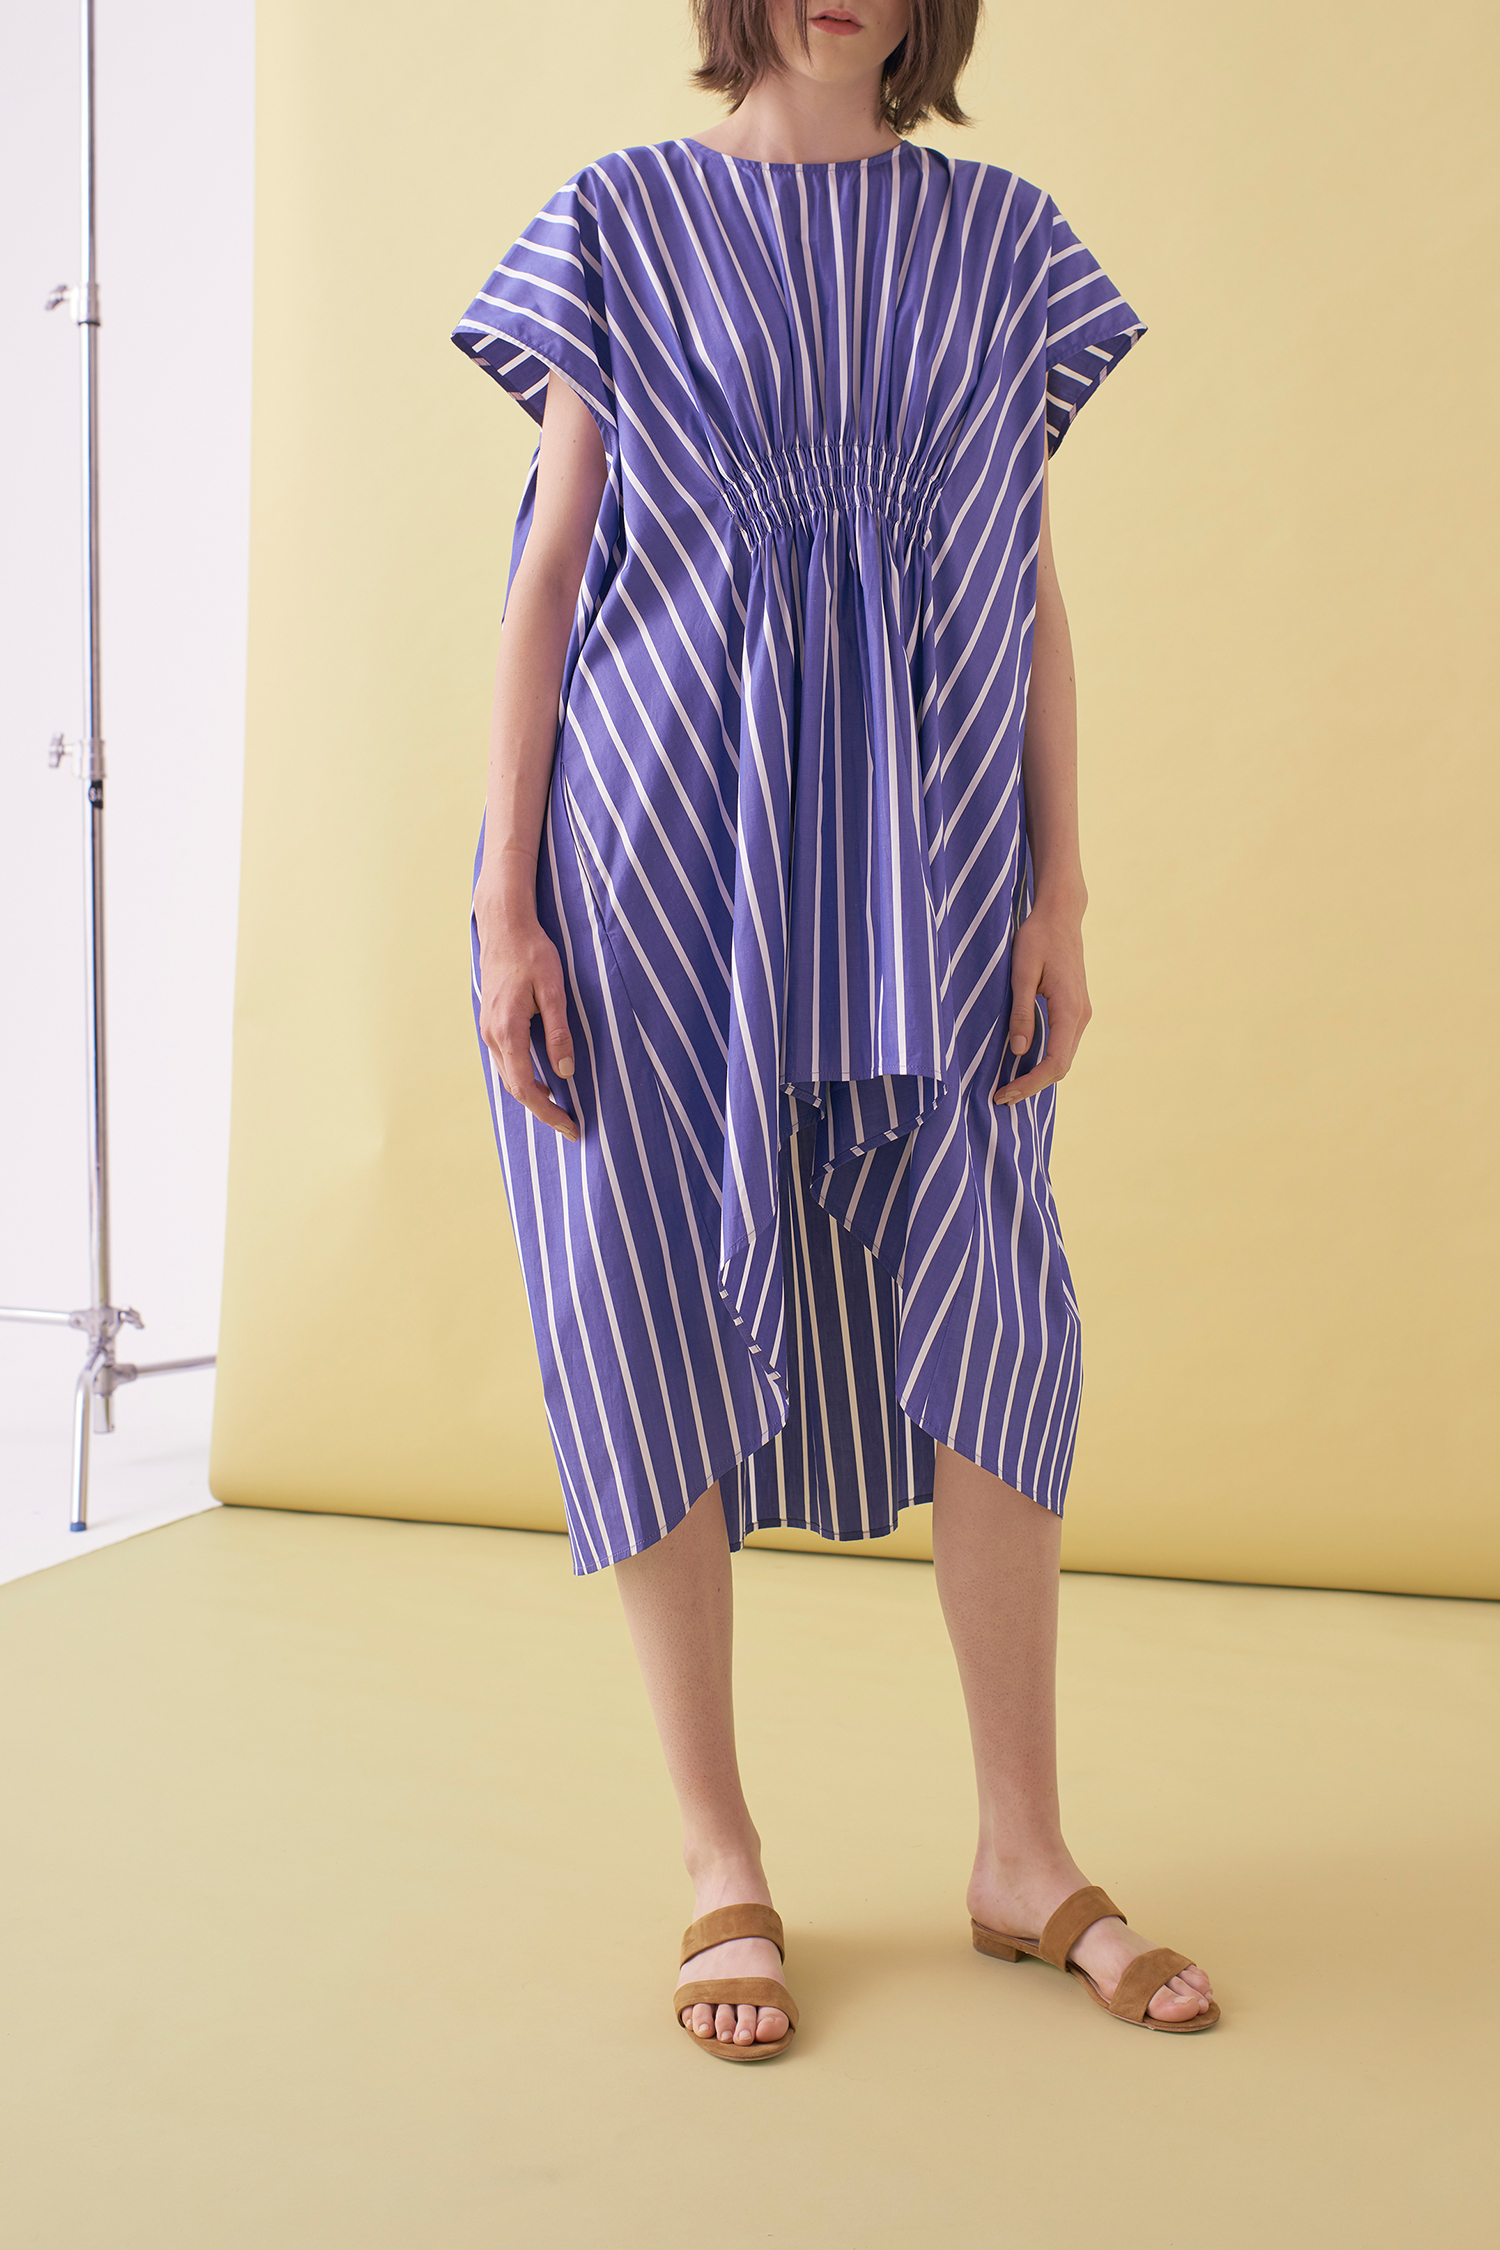 Sarah_Swann_SS17_01_Striped_Shirring_Dress_CeruleanBlue_F.jpg